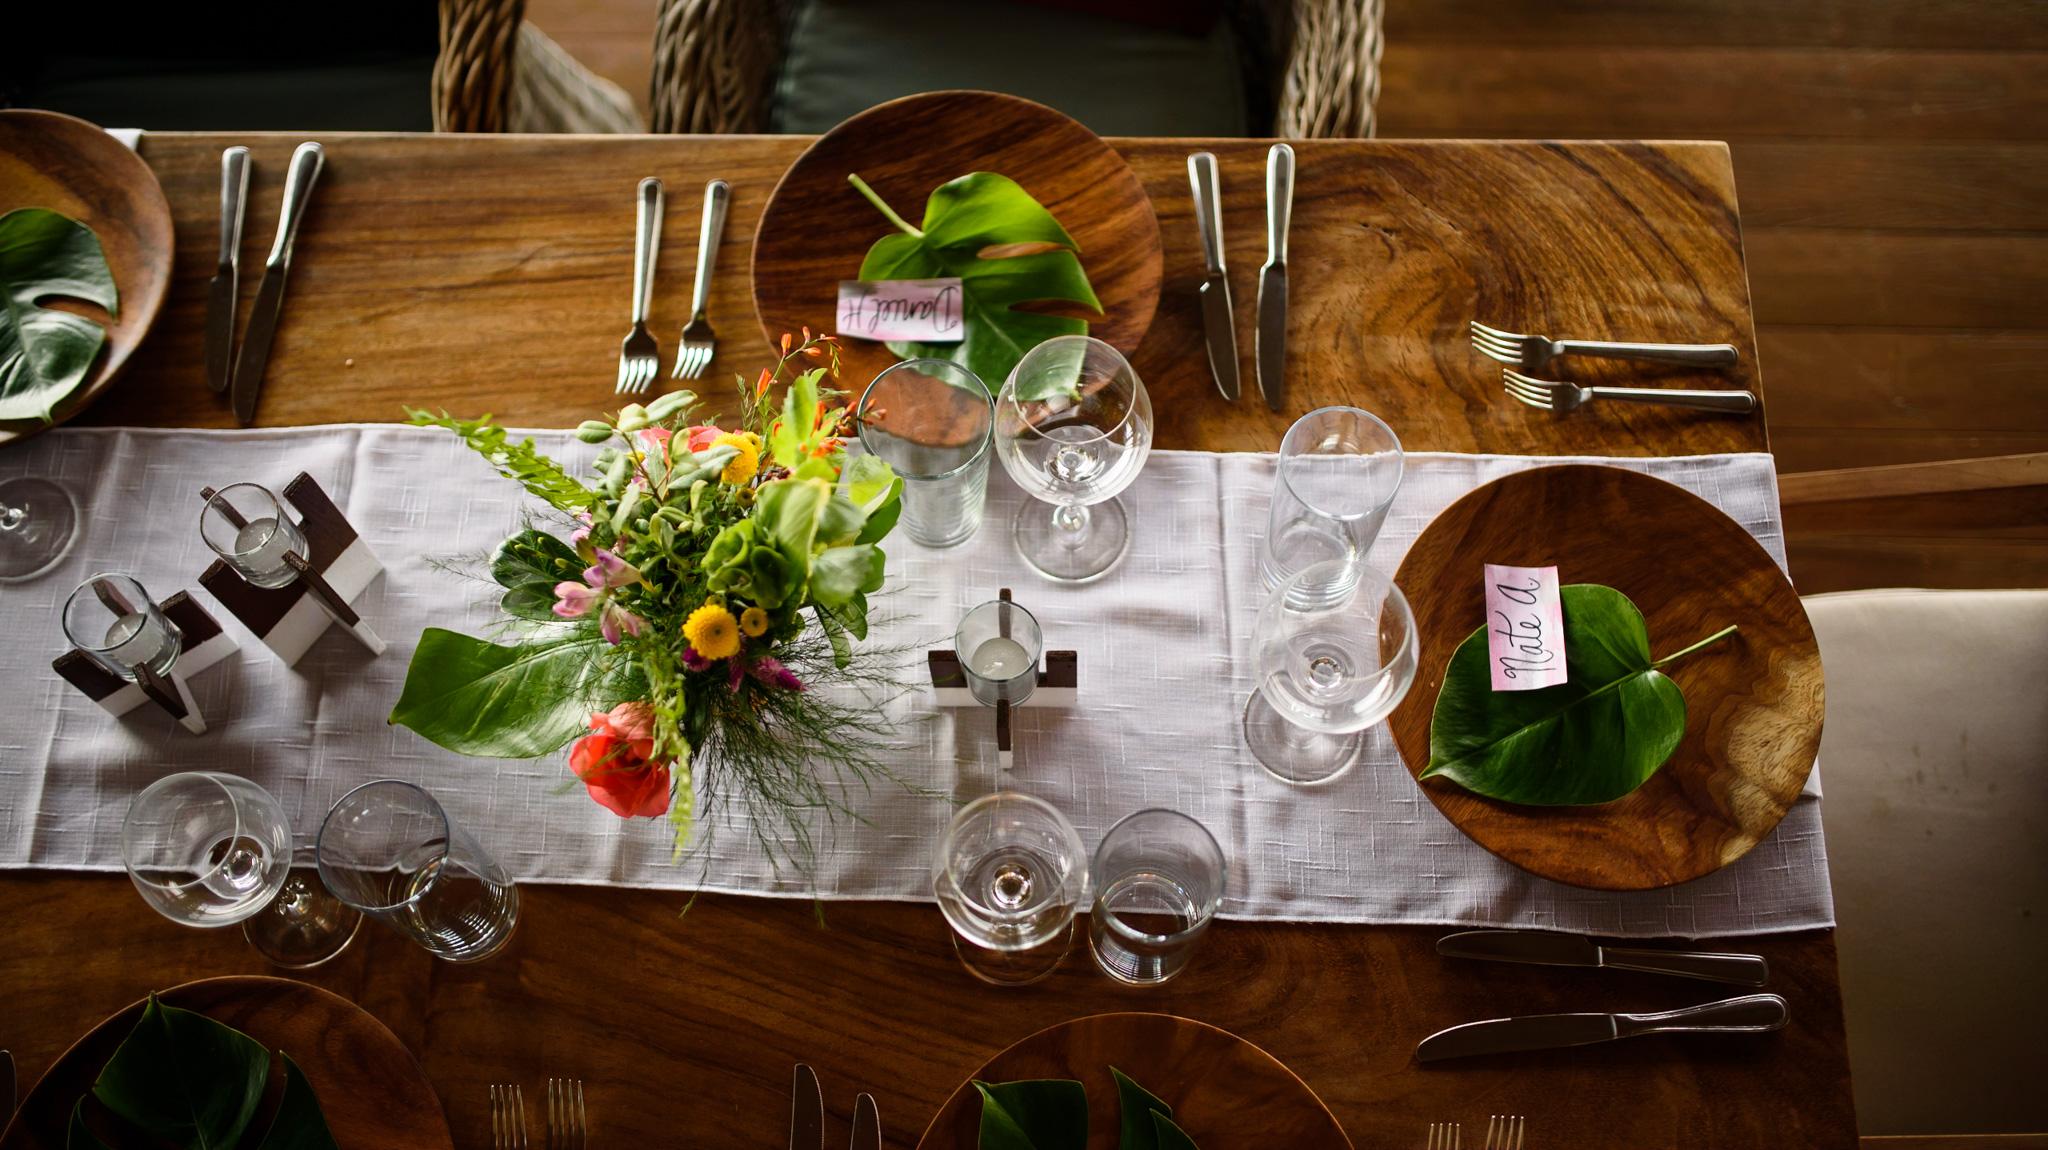 Dreamy wedding setup at Casa Alang Alang